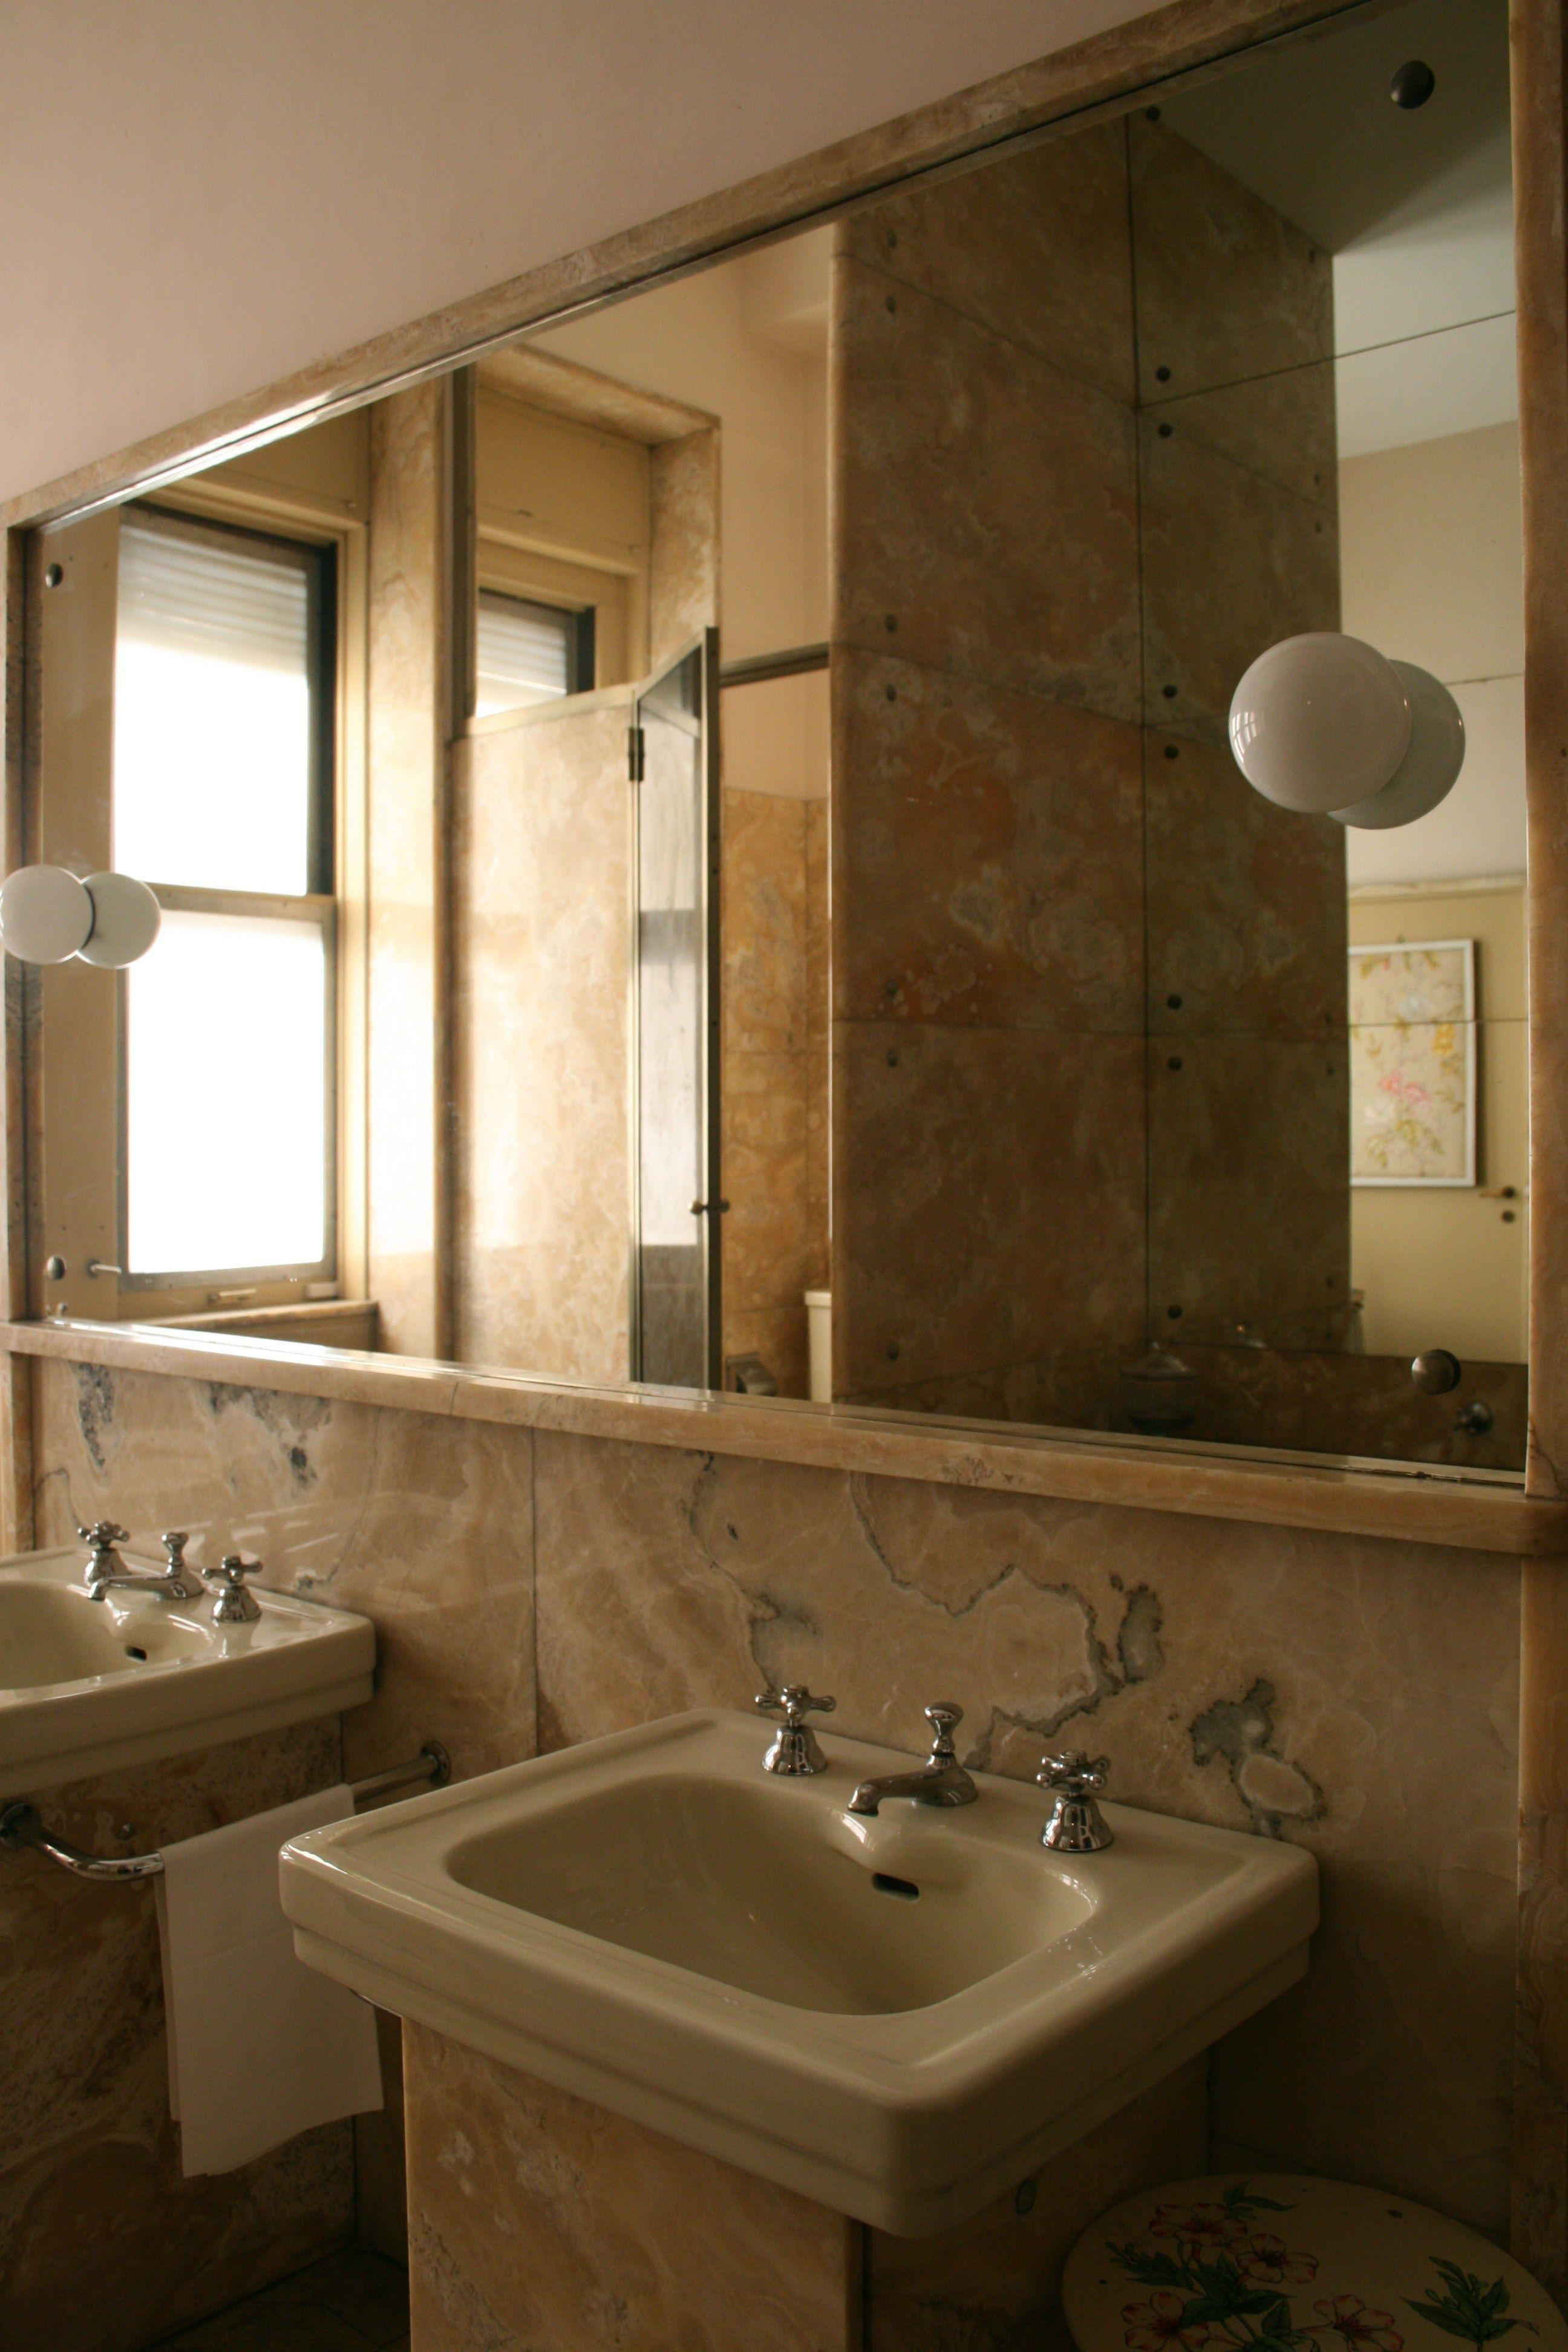 Paris Style Bathroom Decor: Villa Necchi, 1932, Piero Portaluppi